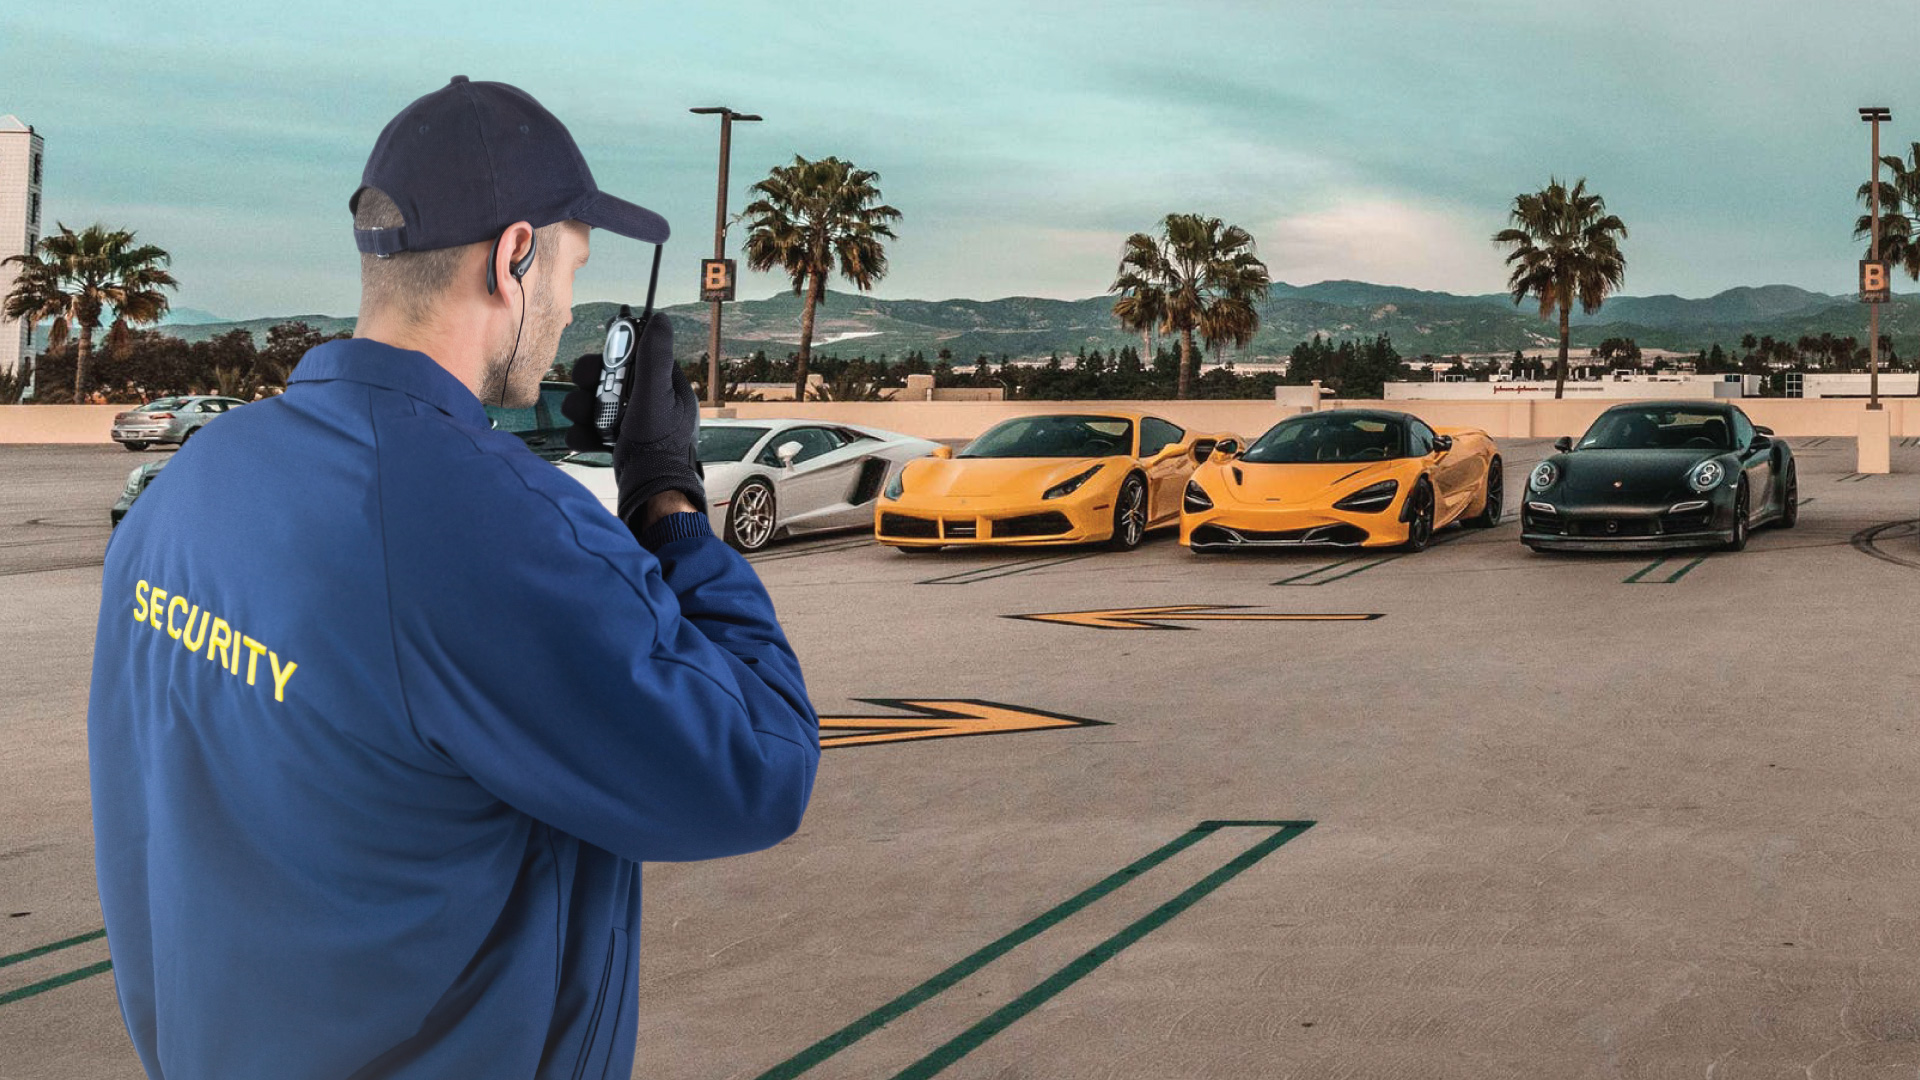 ars vs man guarding luxury car parking lot 1 1920x1080 1